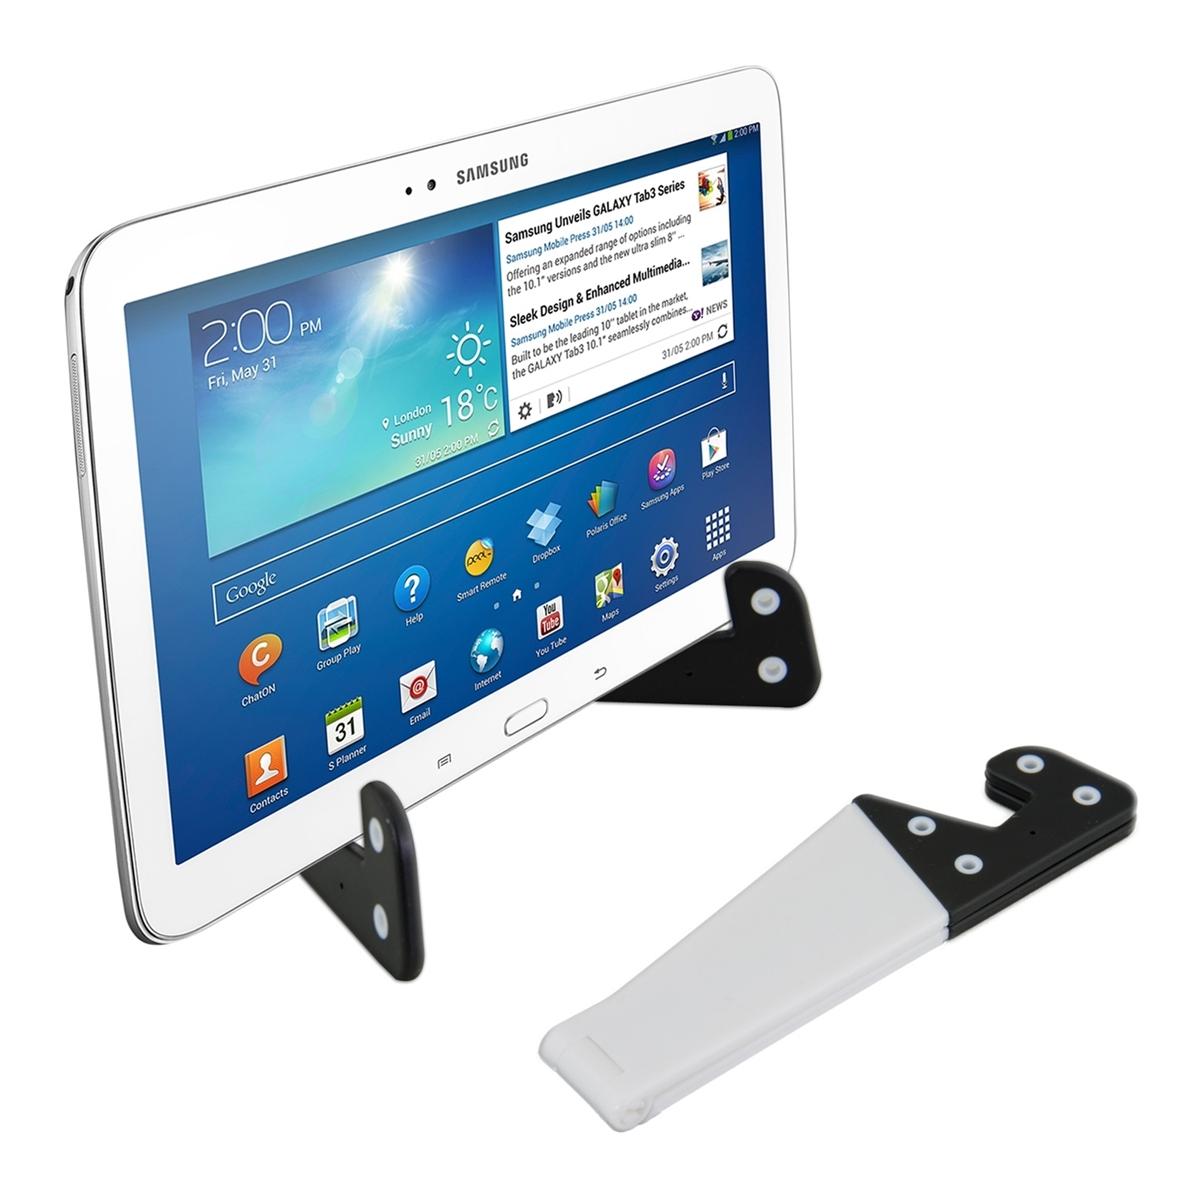 kwmobile tablet halter f r samsung galaxy tab 3 10 1 st nder halterung magnet ebay. Black Bedroom Furniture Sets. Home Design Ideas